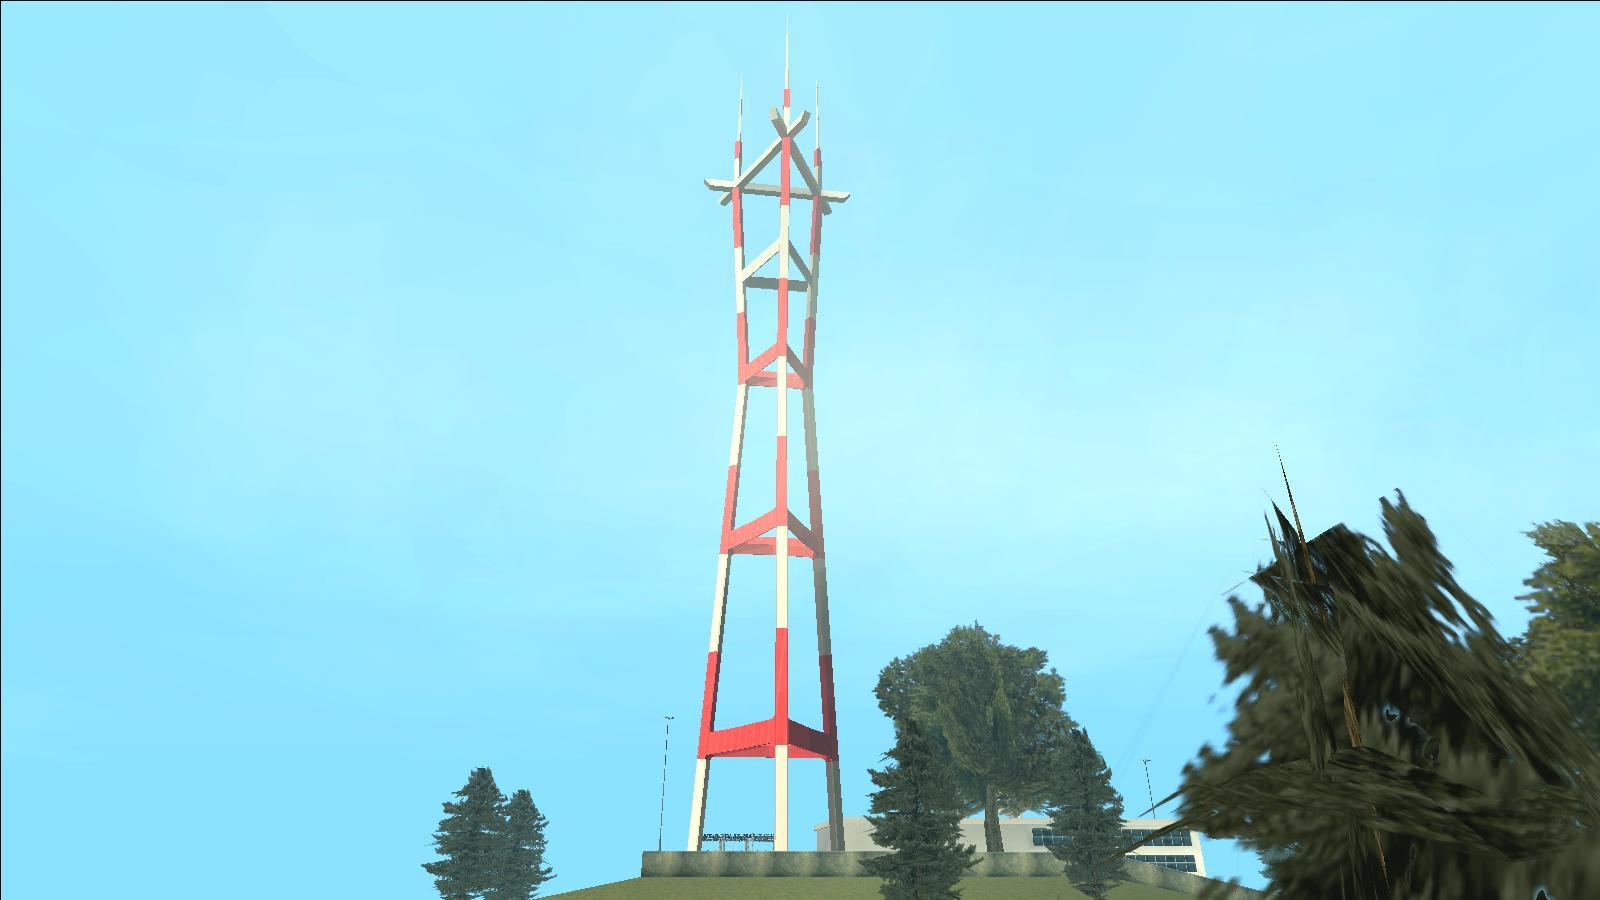 Missionary Hill Radio Tower | GTA Wiki | FANDOM powered by Wikia